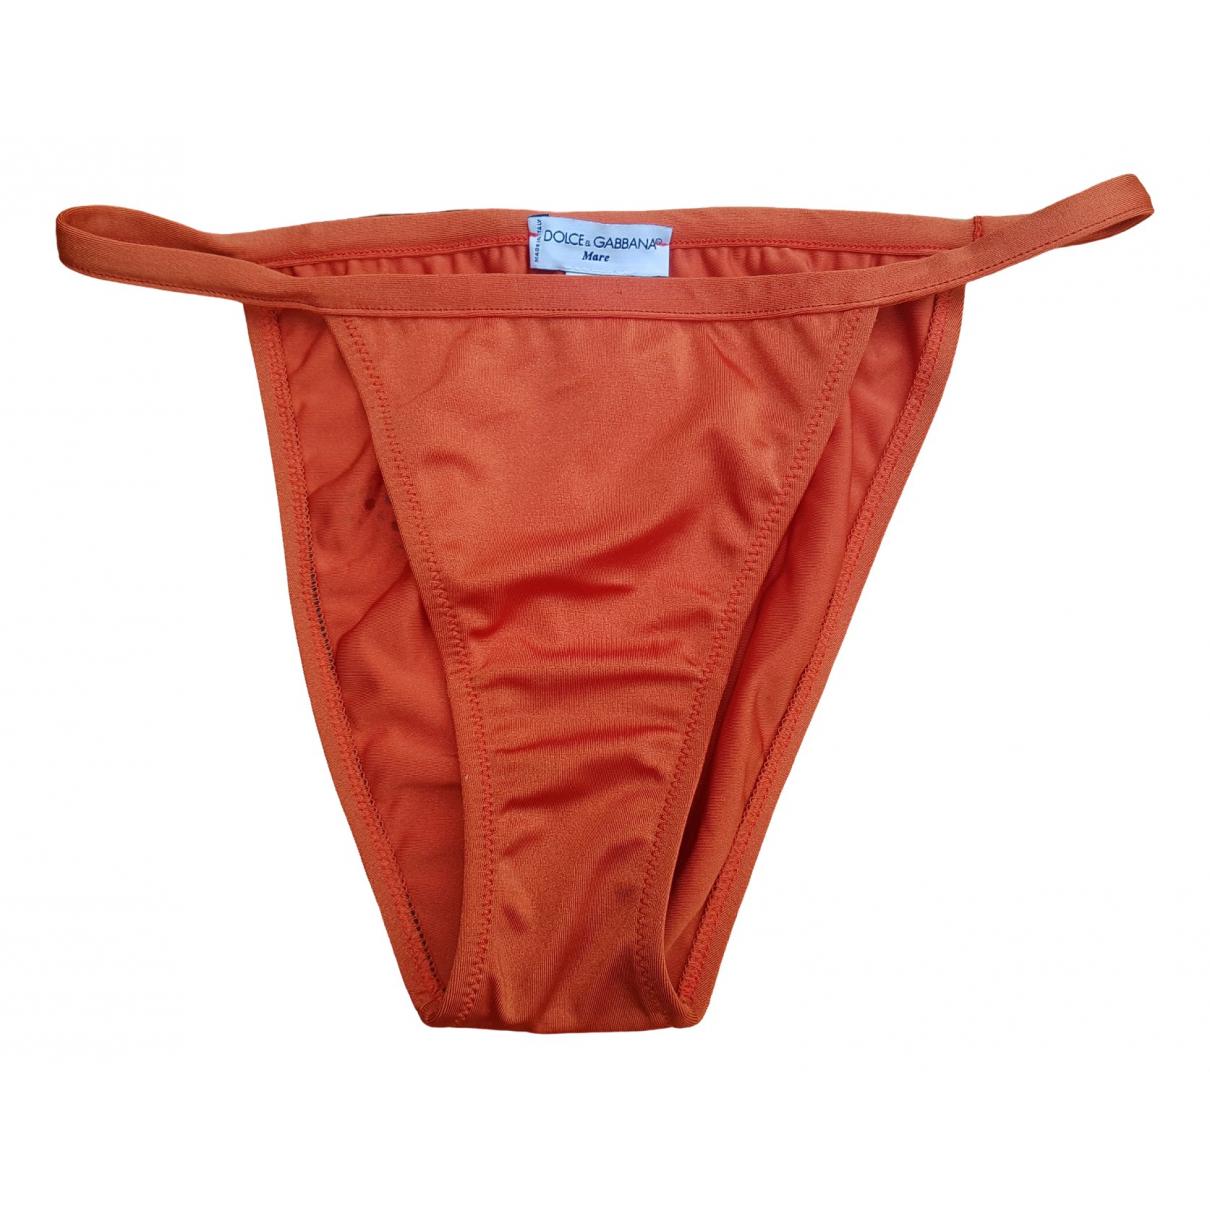 Dolce & Gabbana \N Badeanzug in  Orange Synthetik